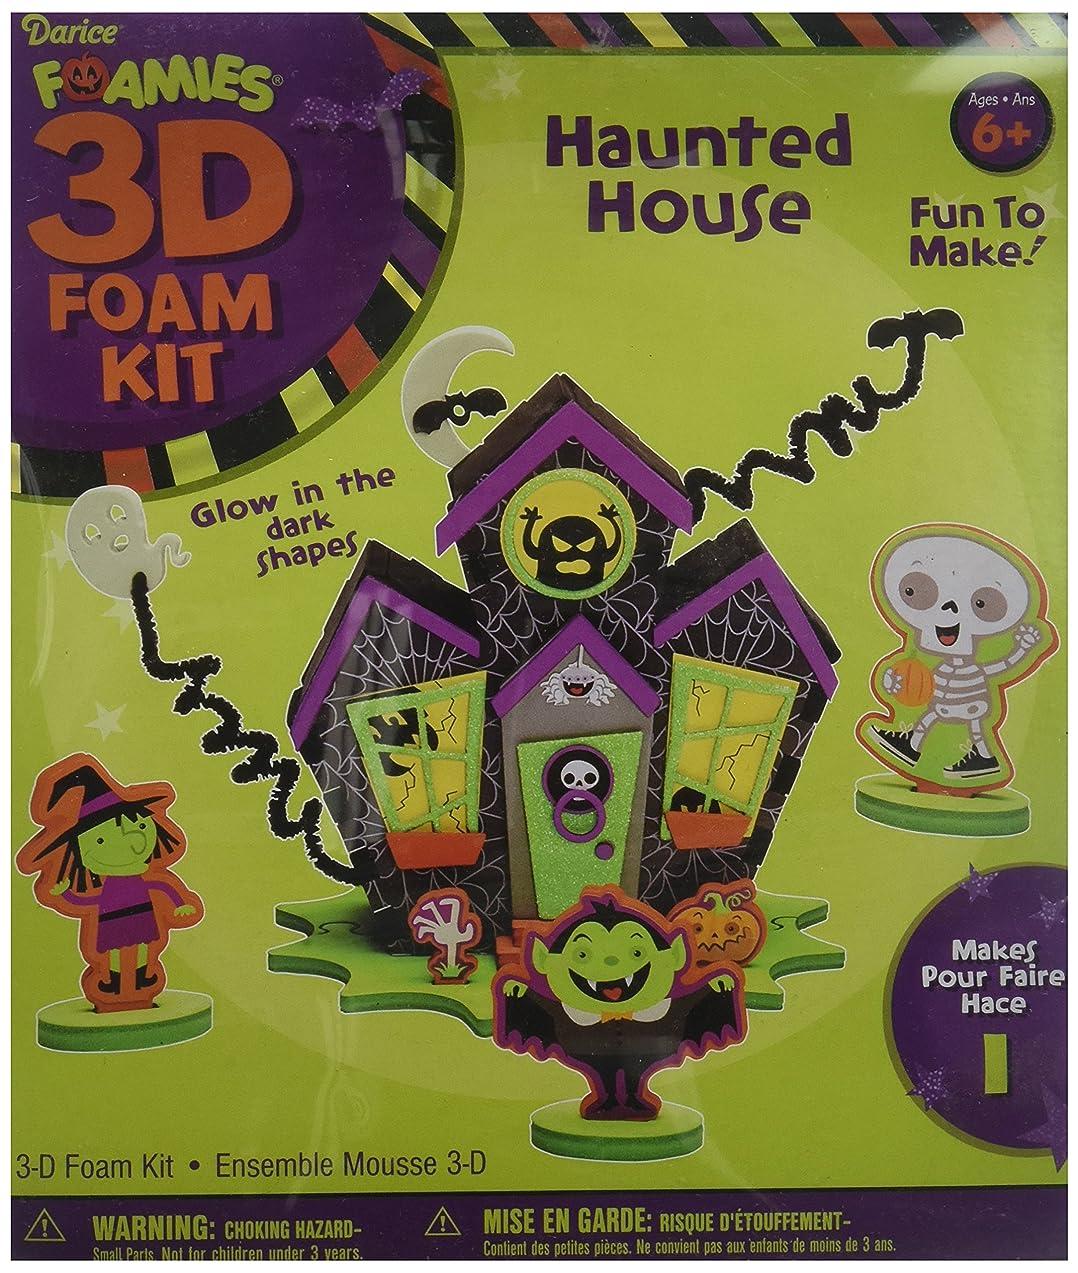 Darice Foam 3D Haunted House